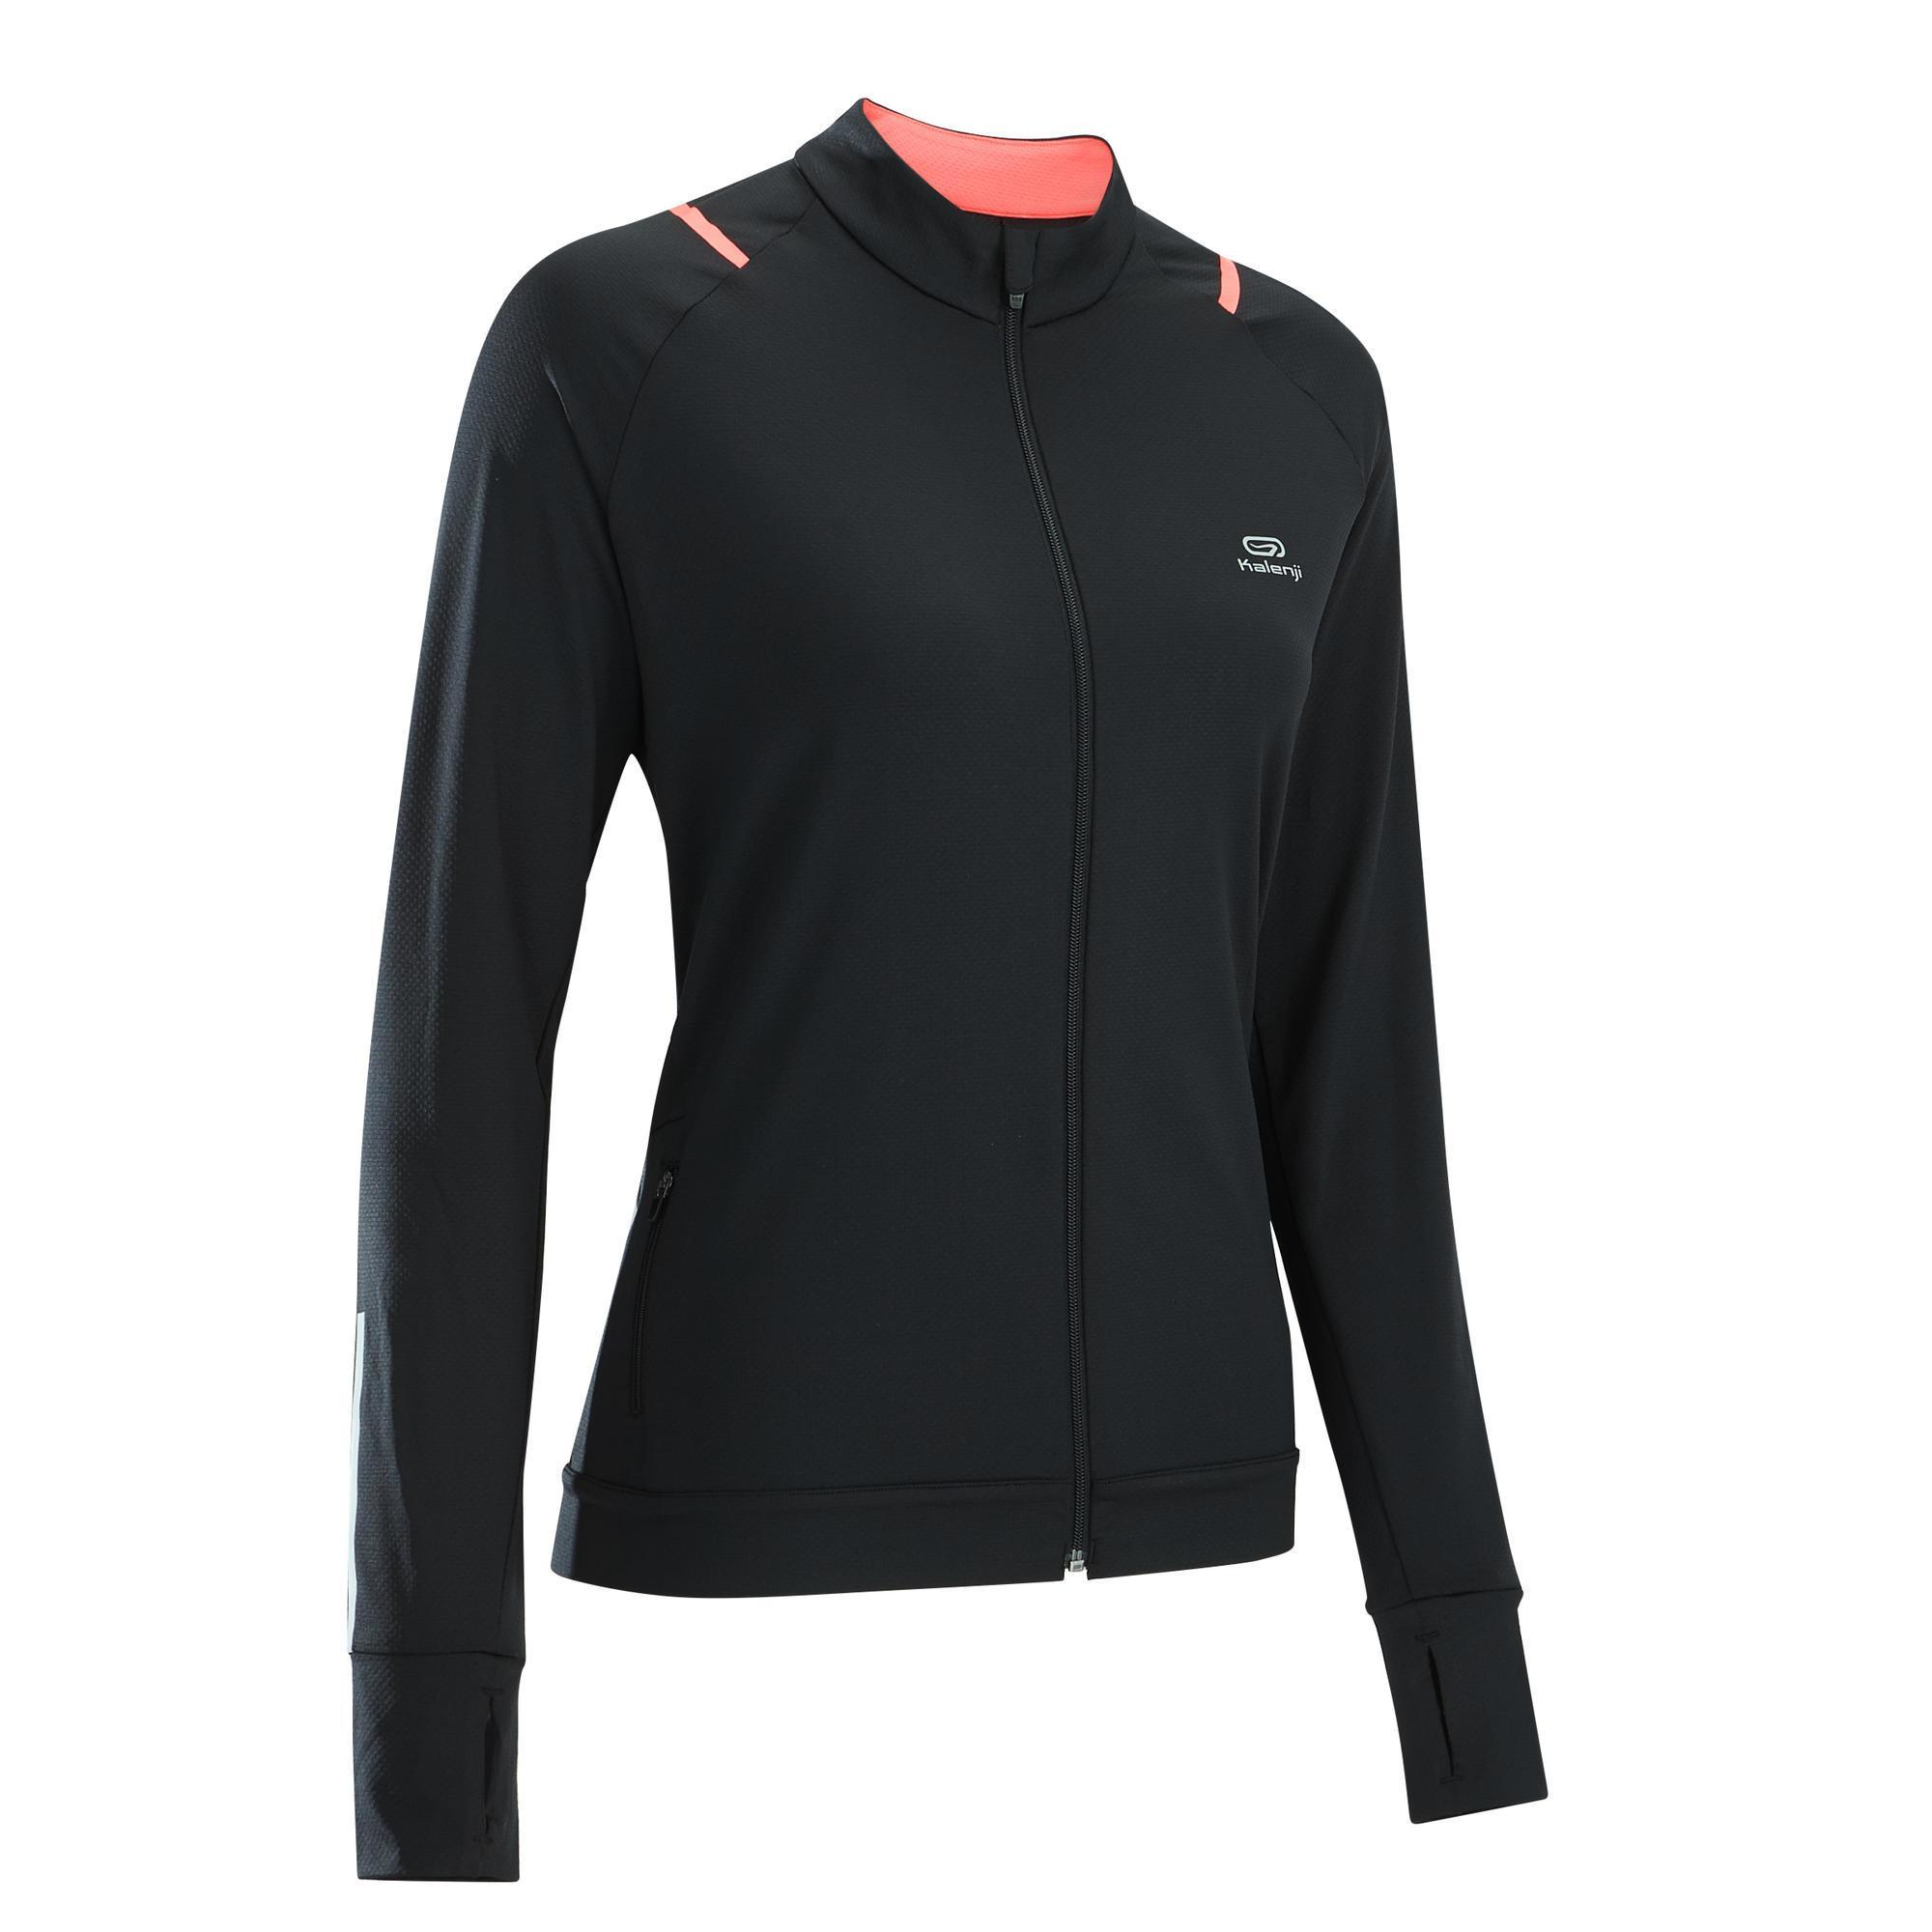 Laufjacke Run Dry Damen schwarz/koralle | Sportbekleidung > Sportjacken > Laufjacken | Schwarz - Rot - Rosa | Kalenji